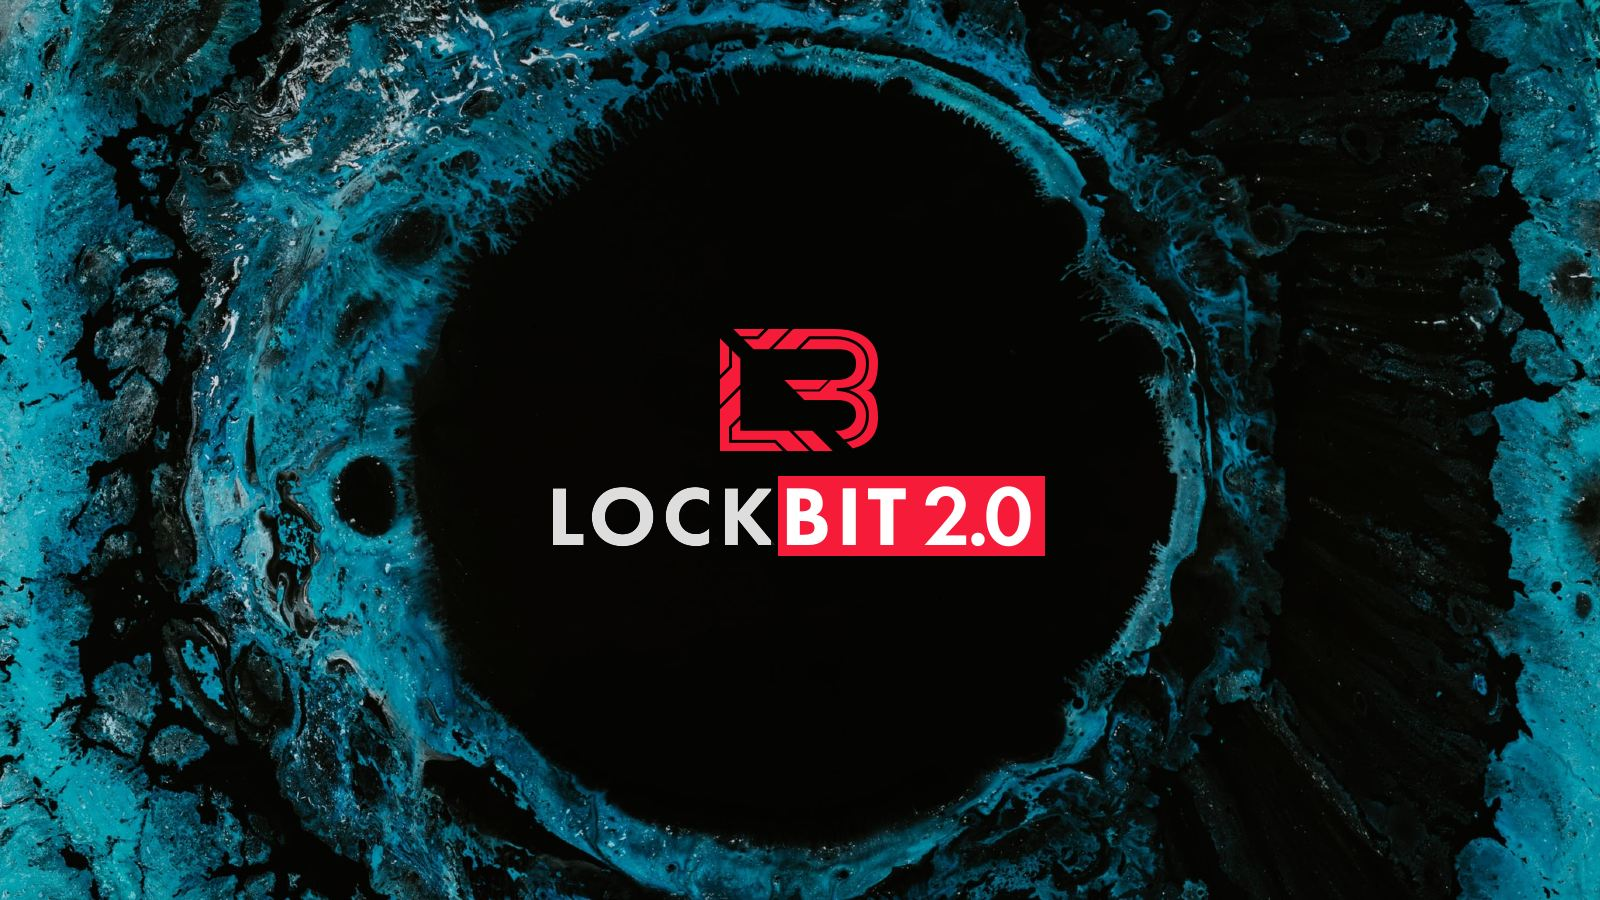 LockBit ransomware leaks Bangkok Airways data, goes after Accenture customers